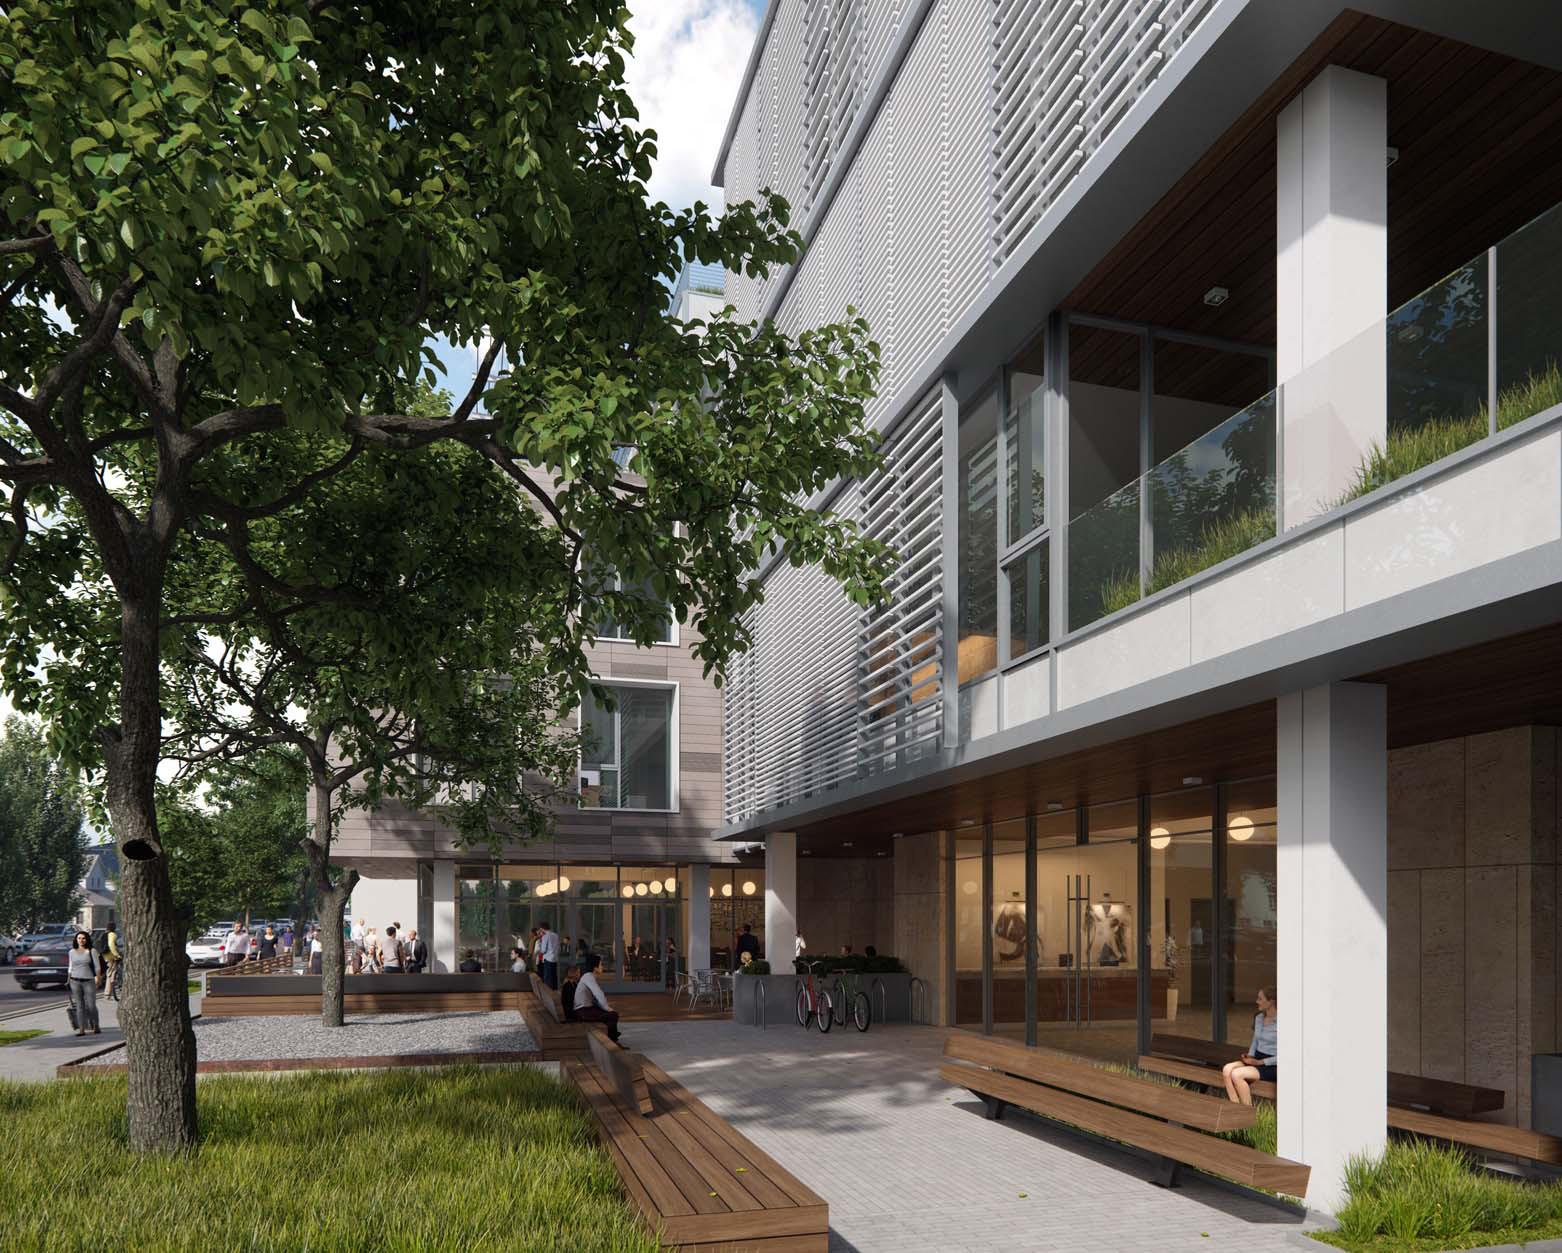 Magnolia trees shade entrance of 950 Villa LEED office building design brick-inc